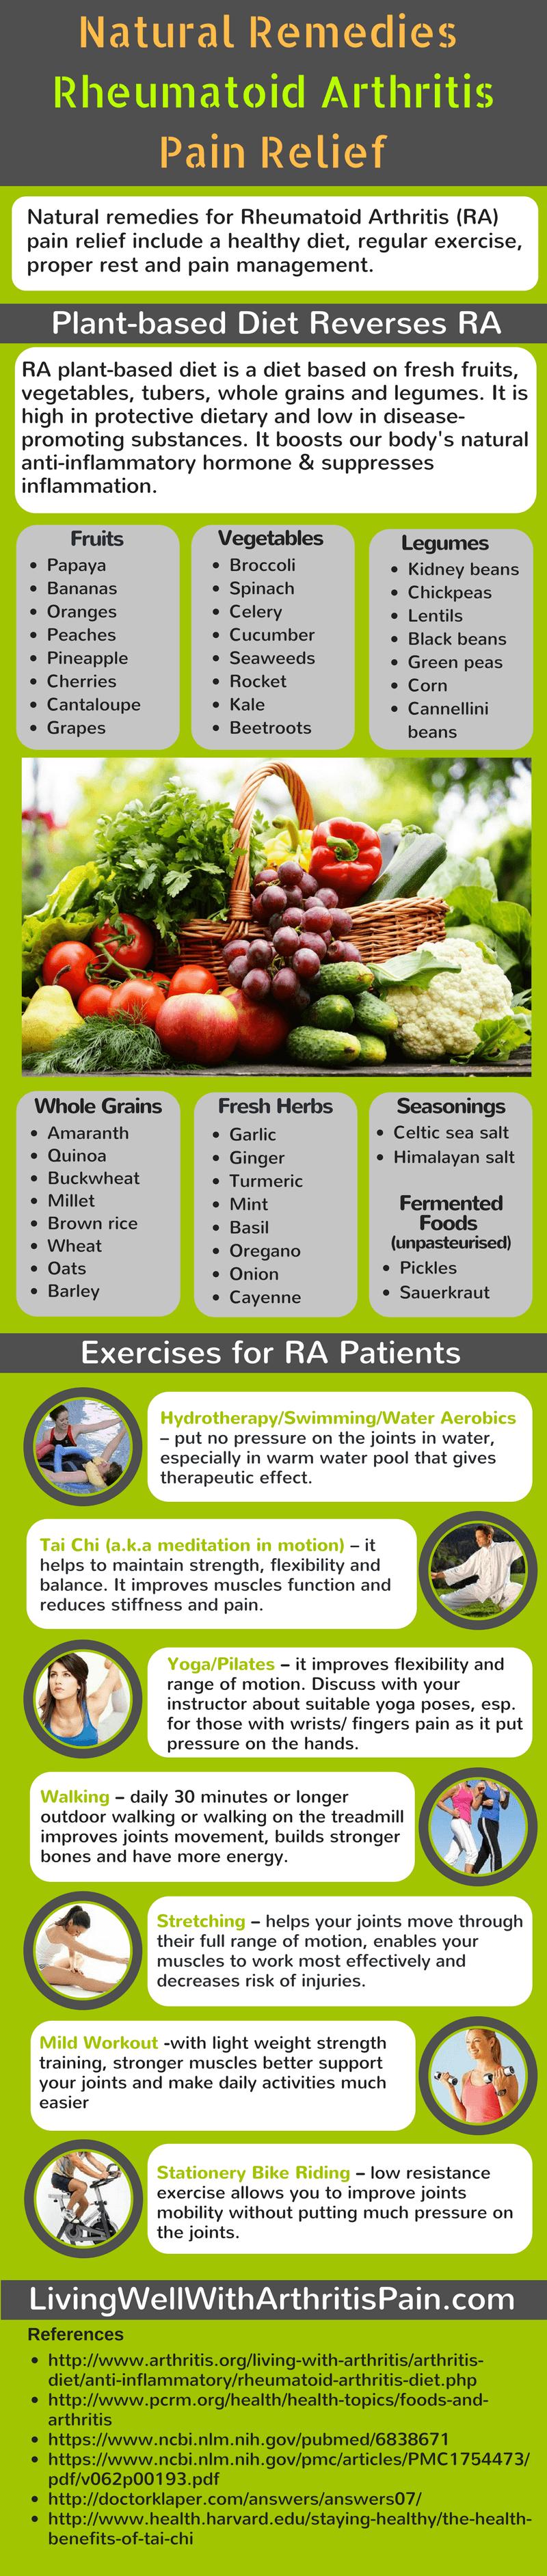 home remedies for rheumatoid arthritis-massage